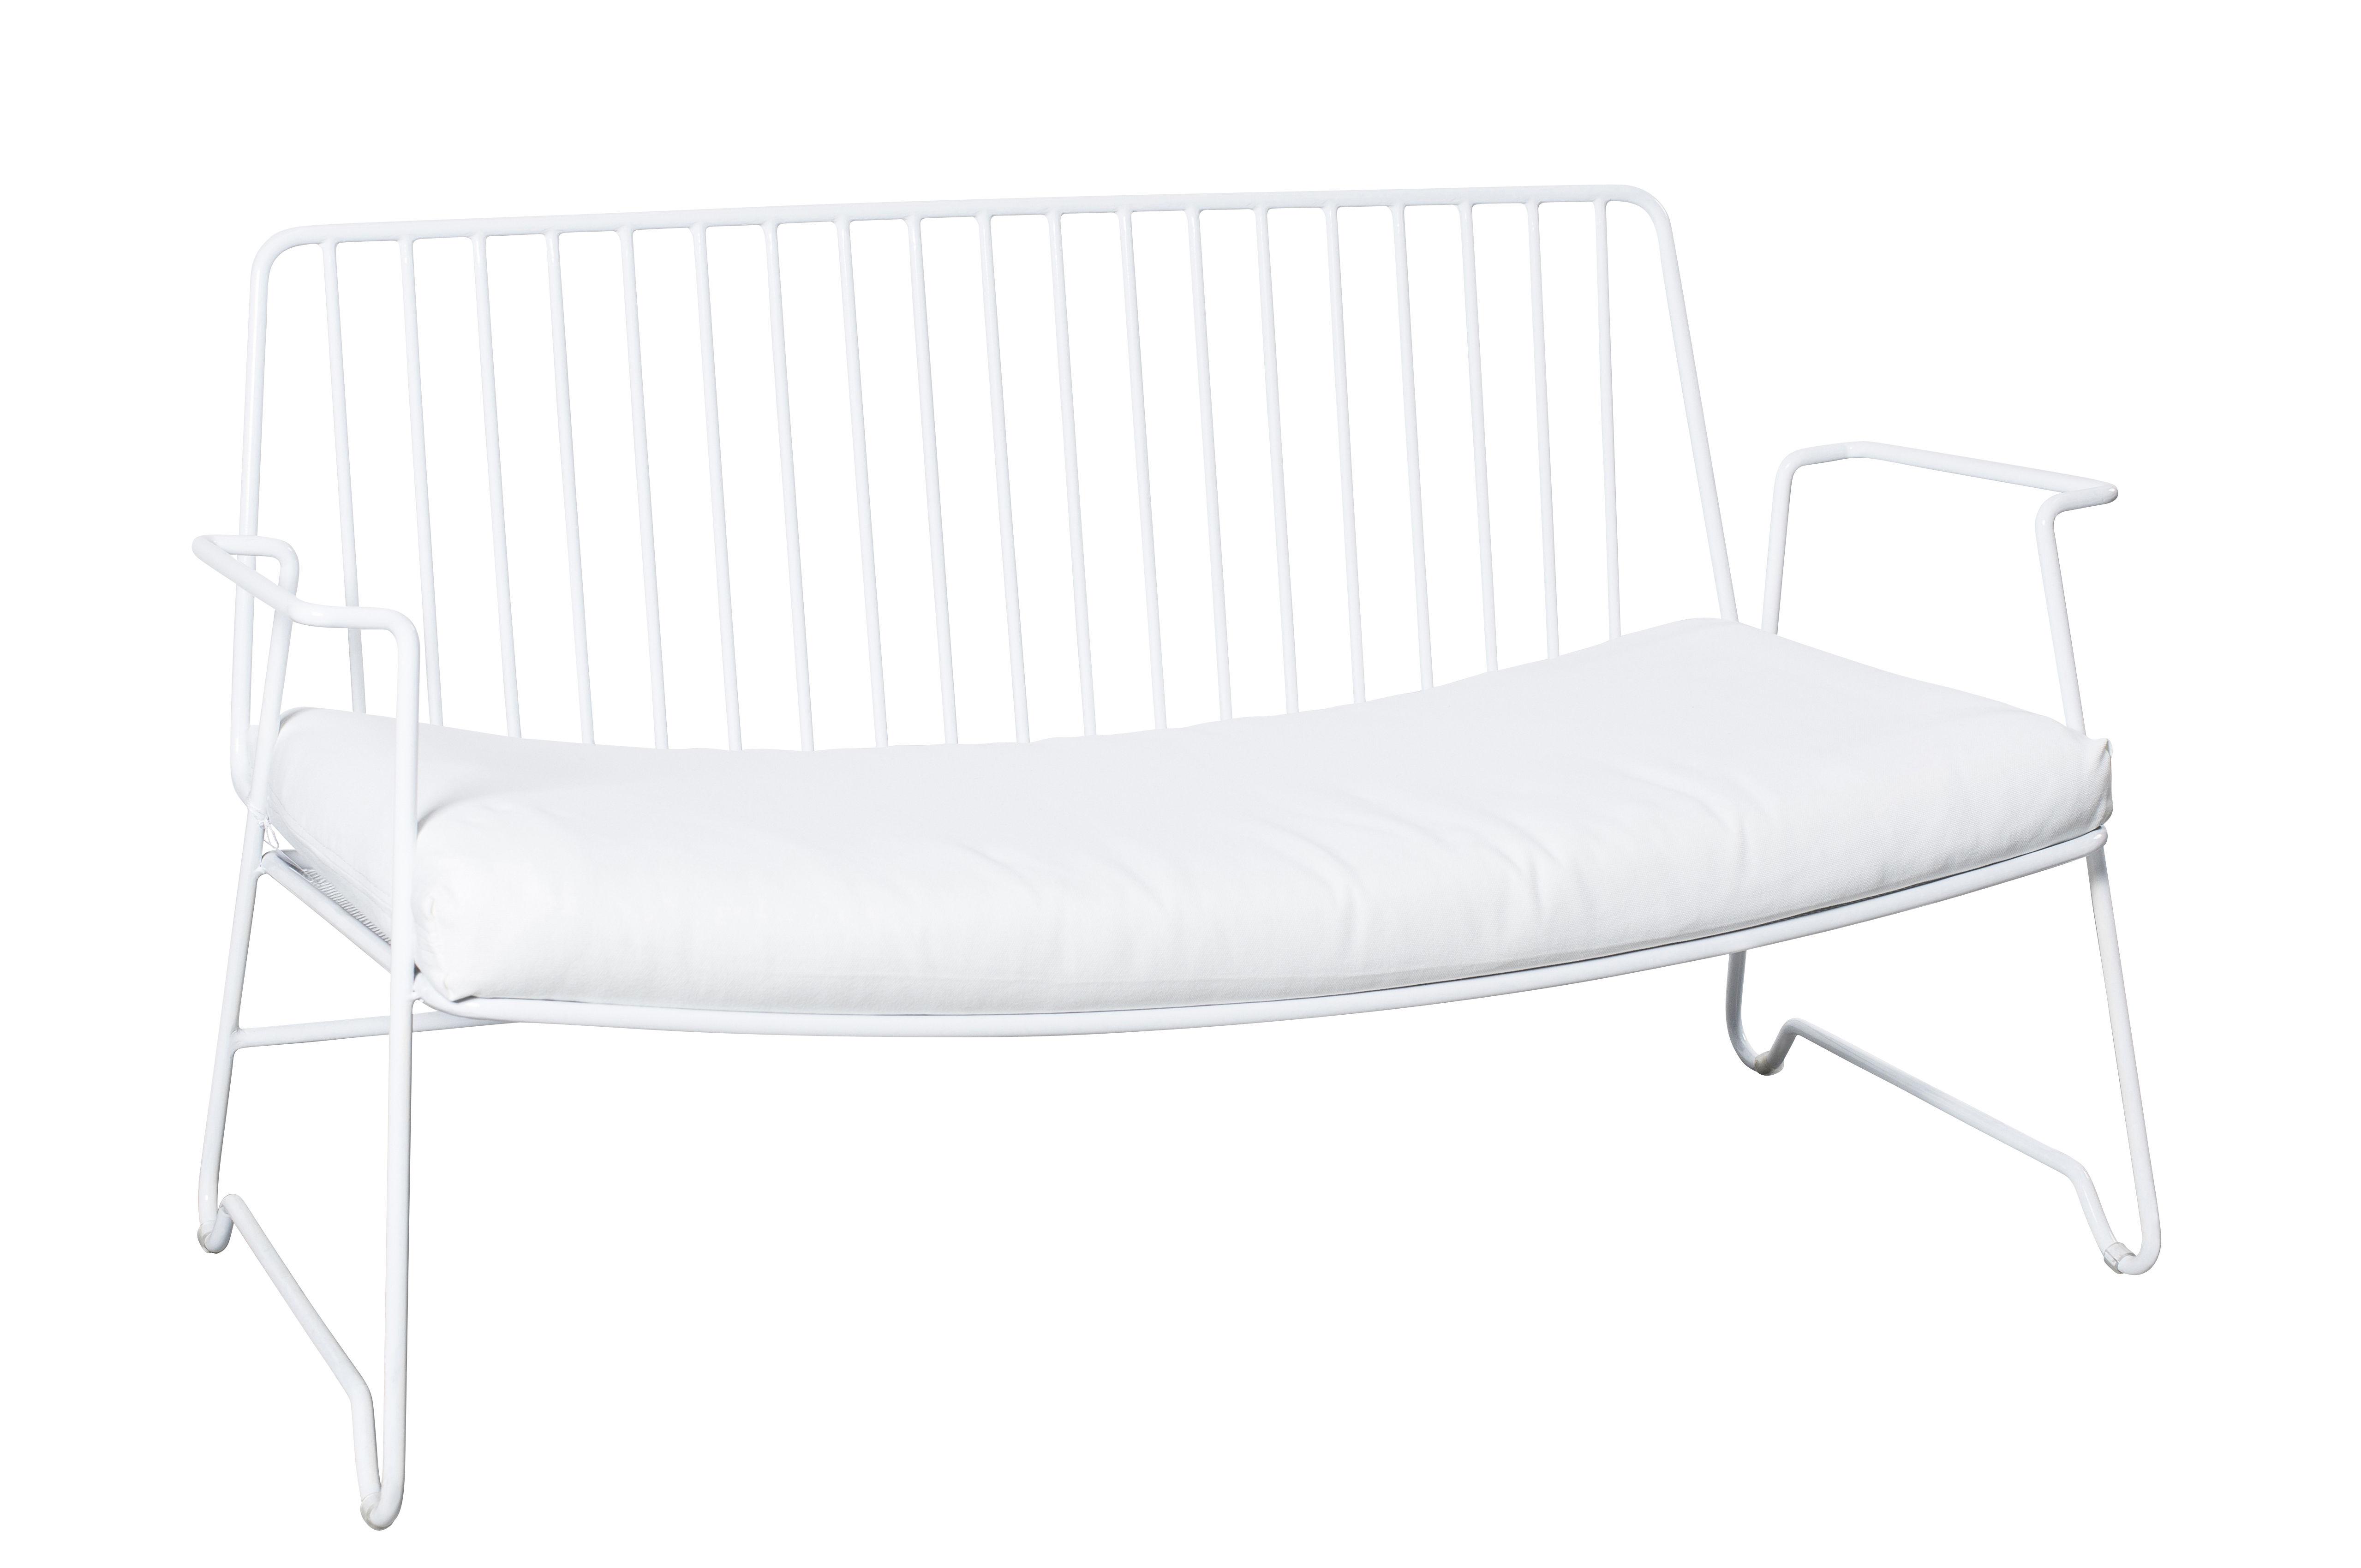 Furniture - Sofas - Fish & Fish Straight sofa - W 115 cm - With seat cushion by Serax - White - Lacquered aluminium, Polyurethane foam, Synthetic fabric